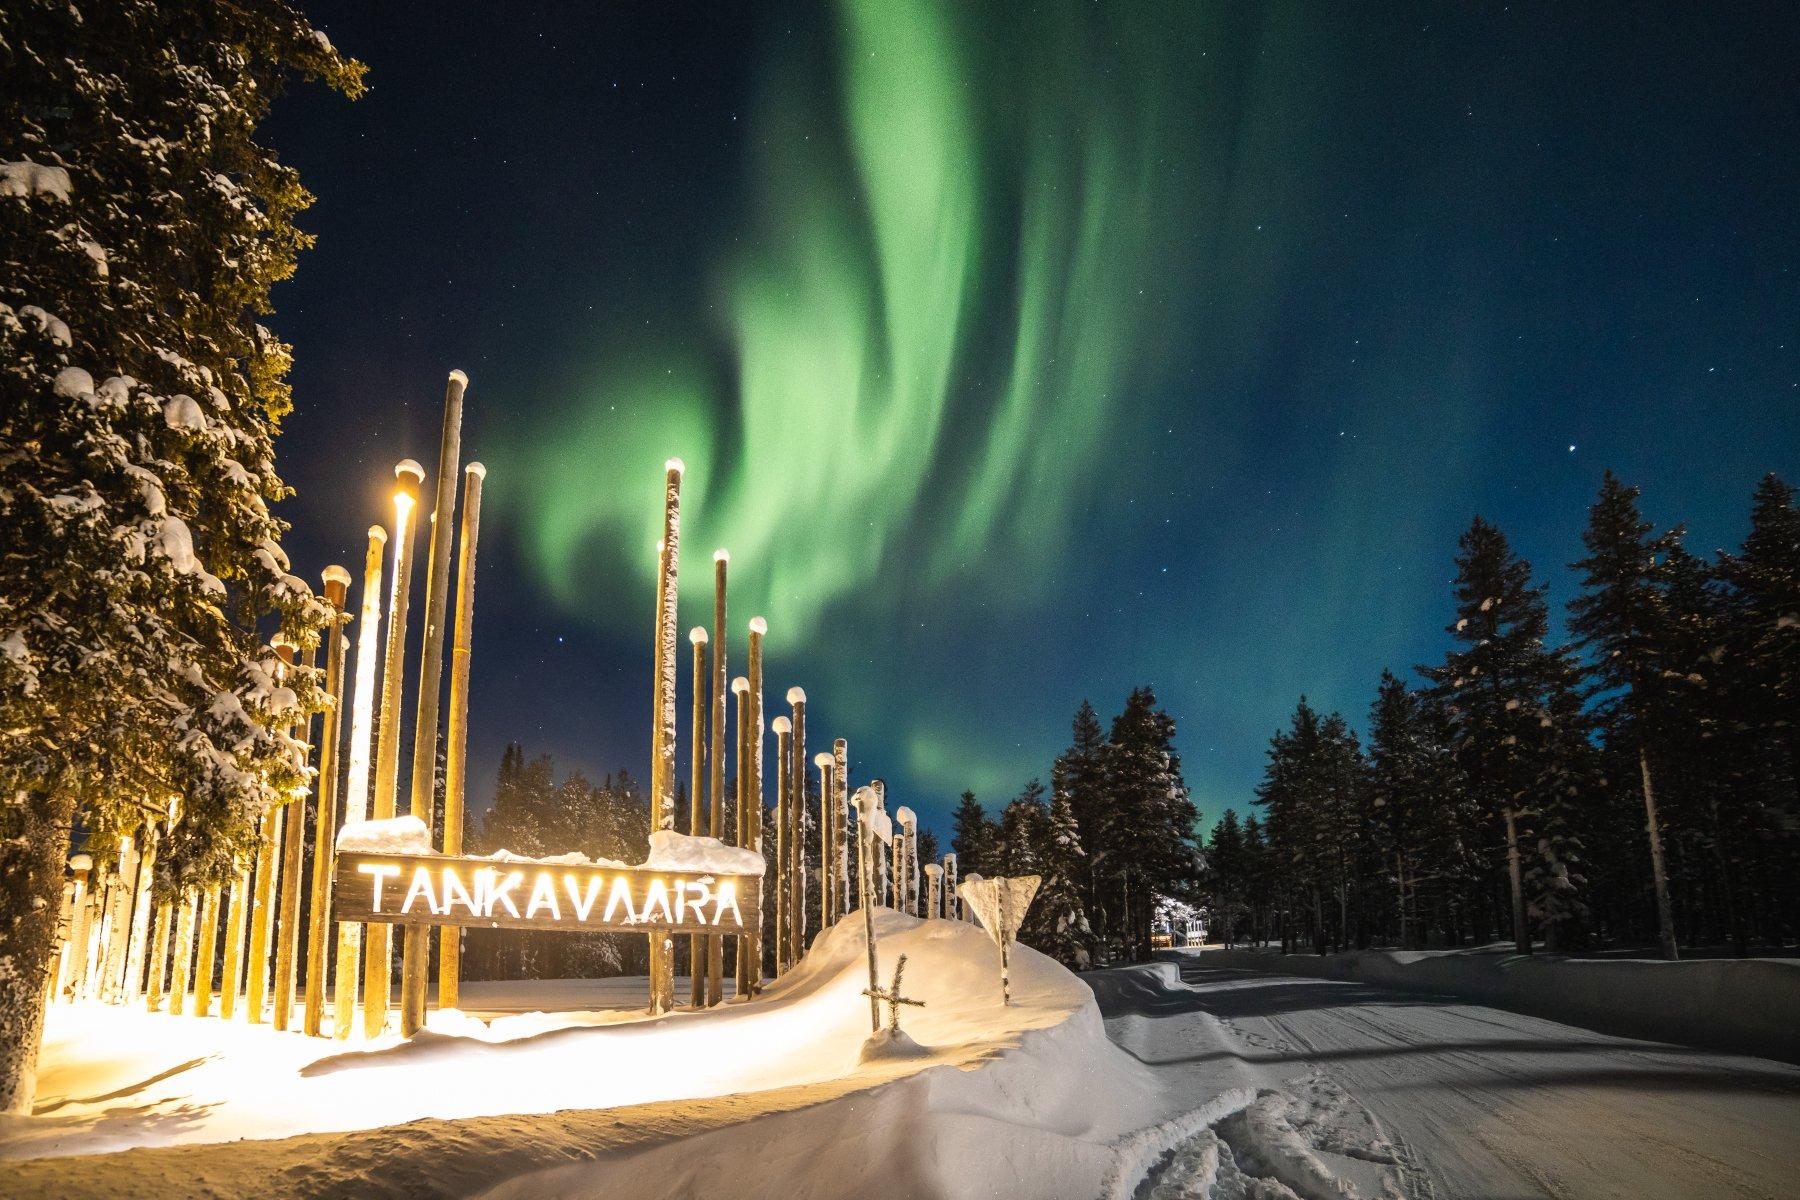 Kuva: Heikki Sulander